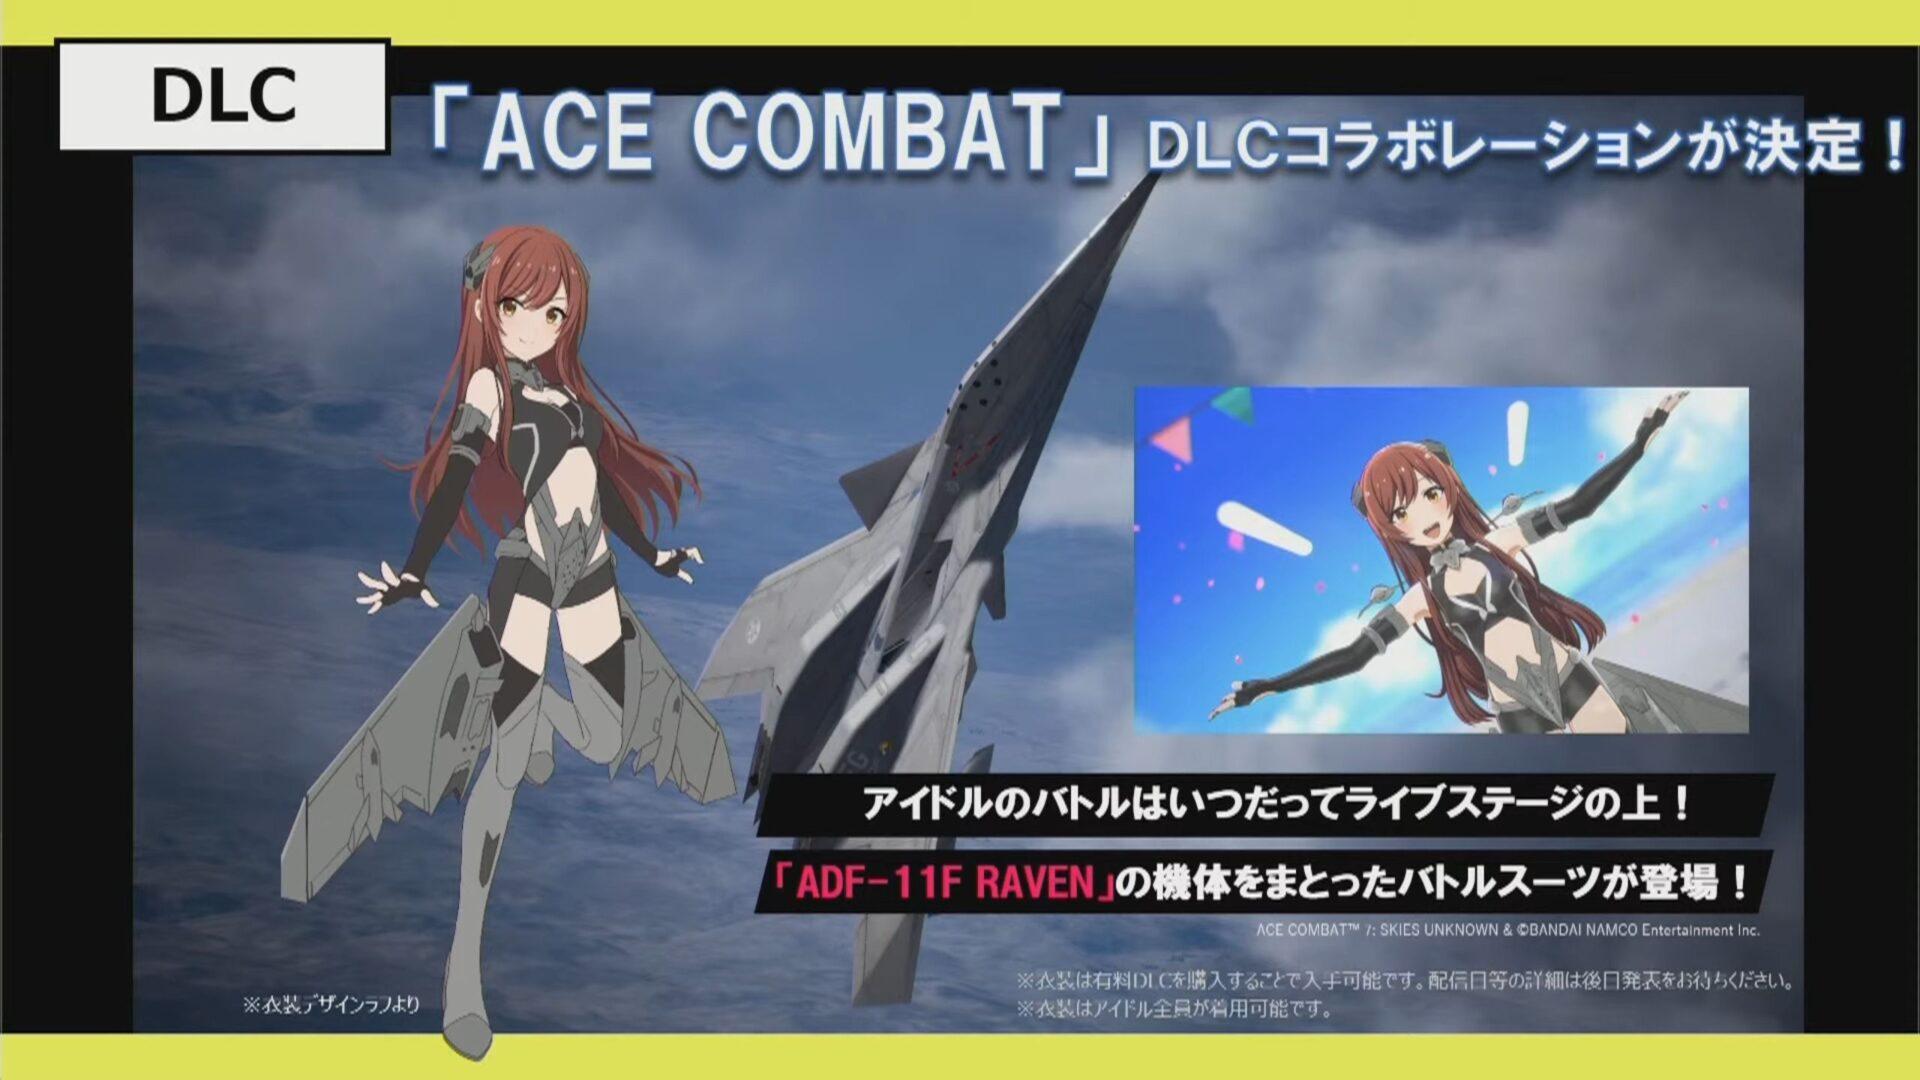 Idolmaster Ace Combat